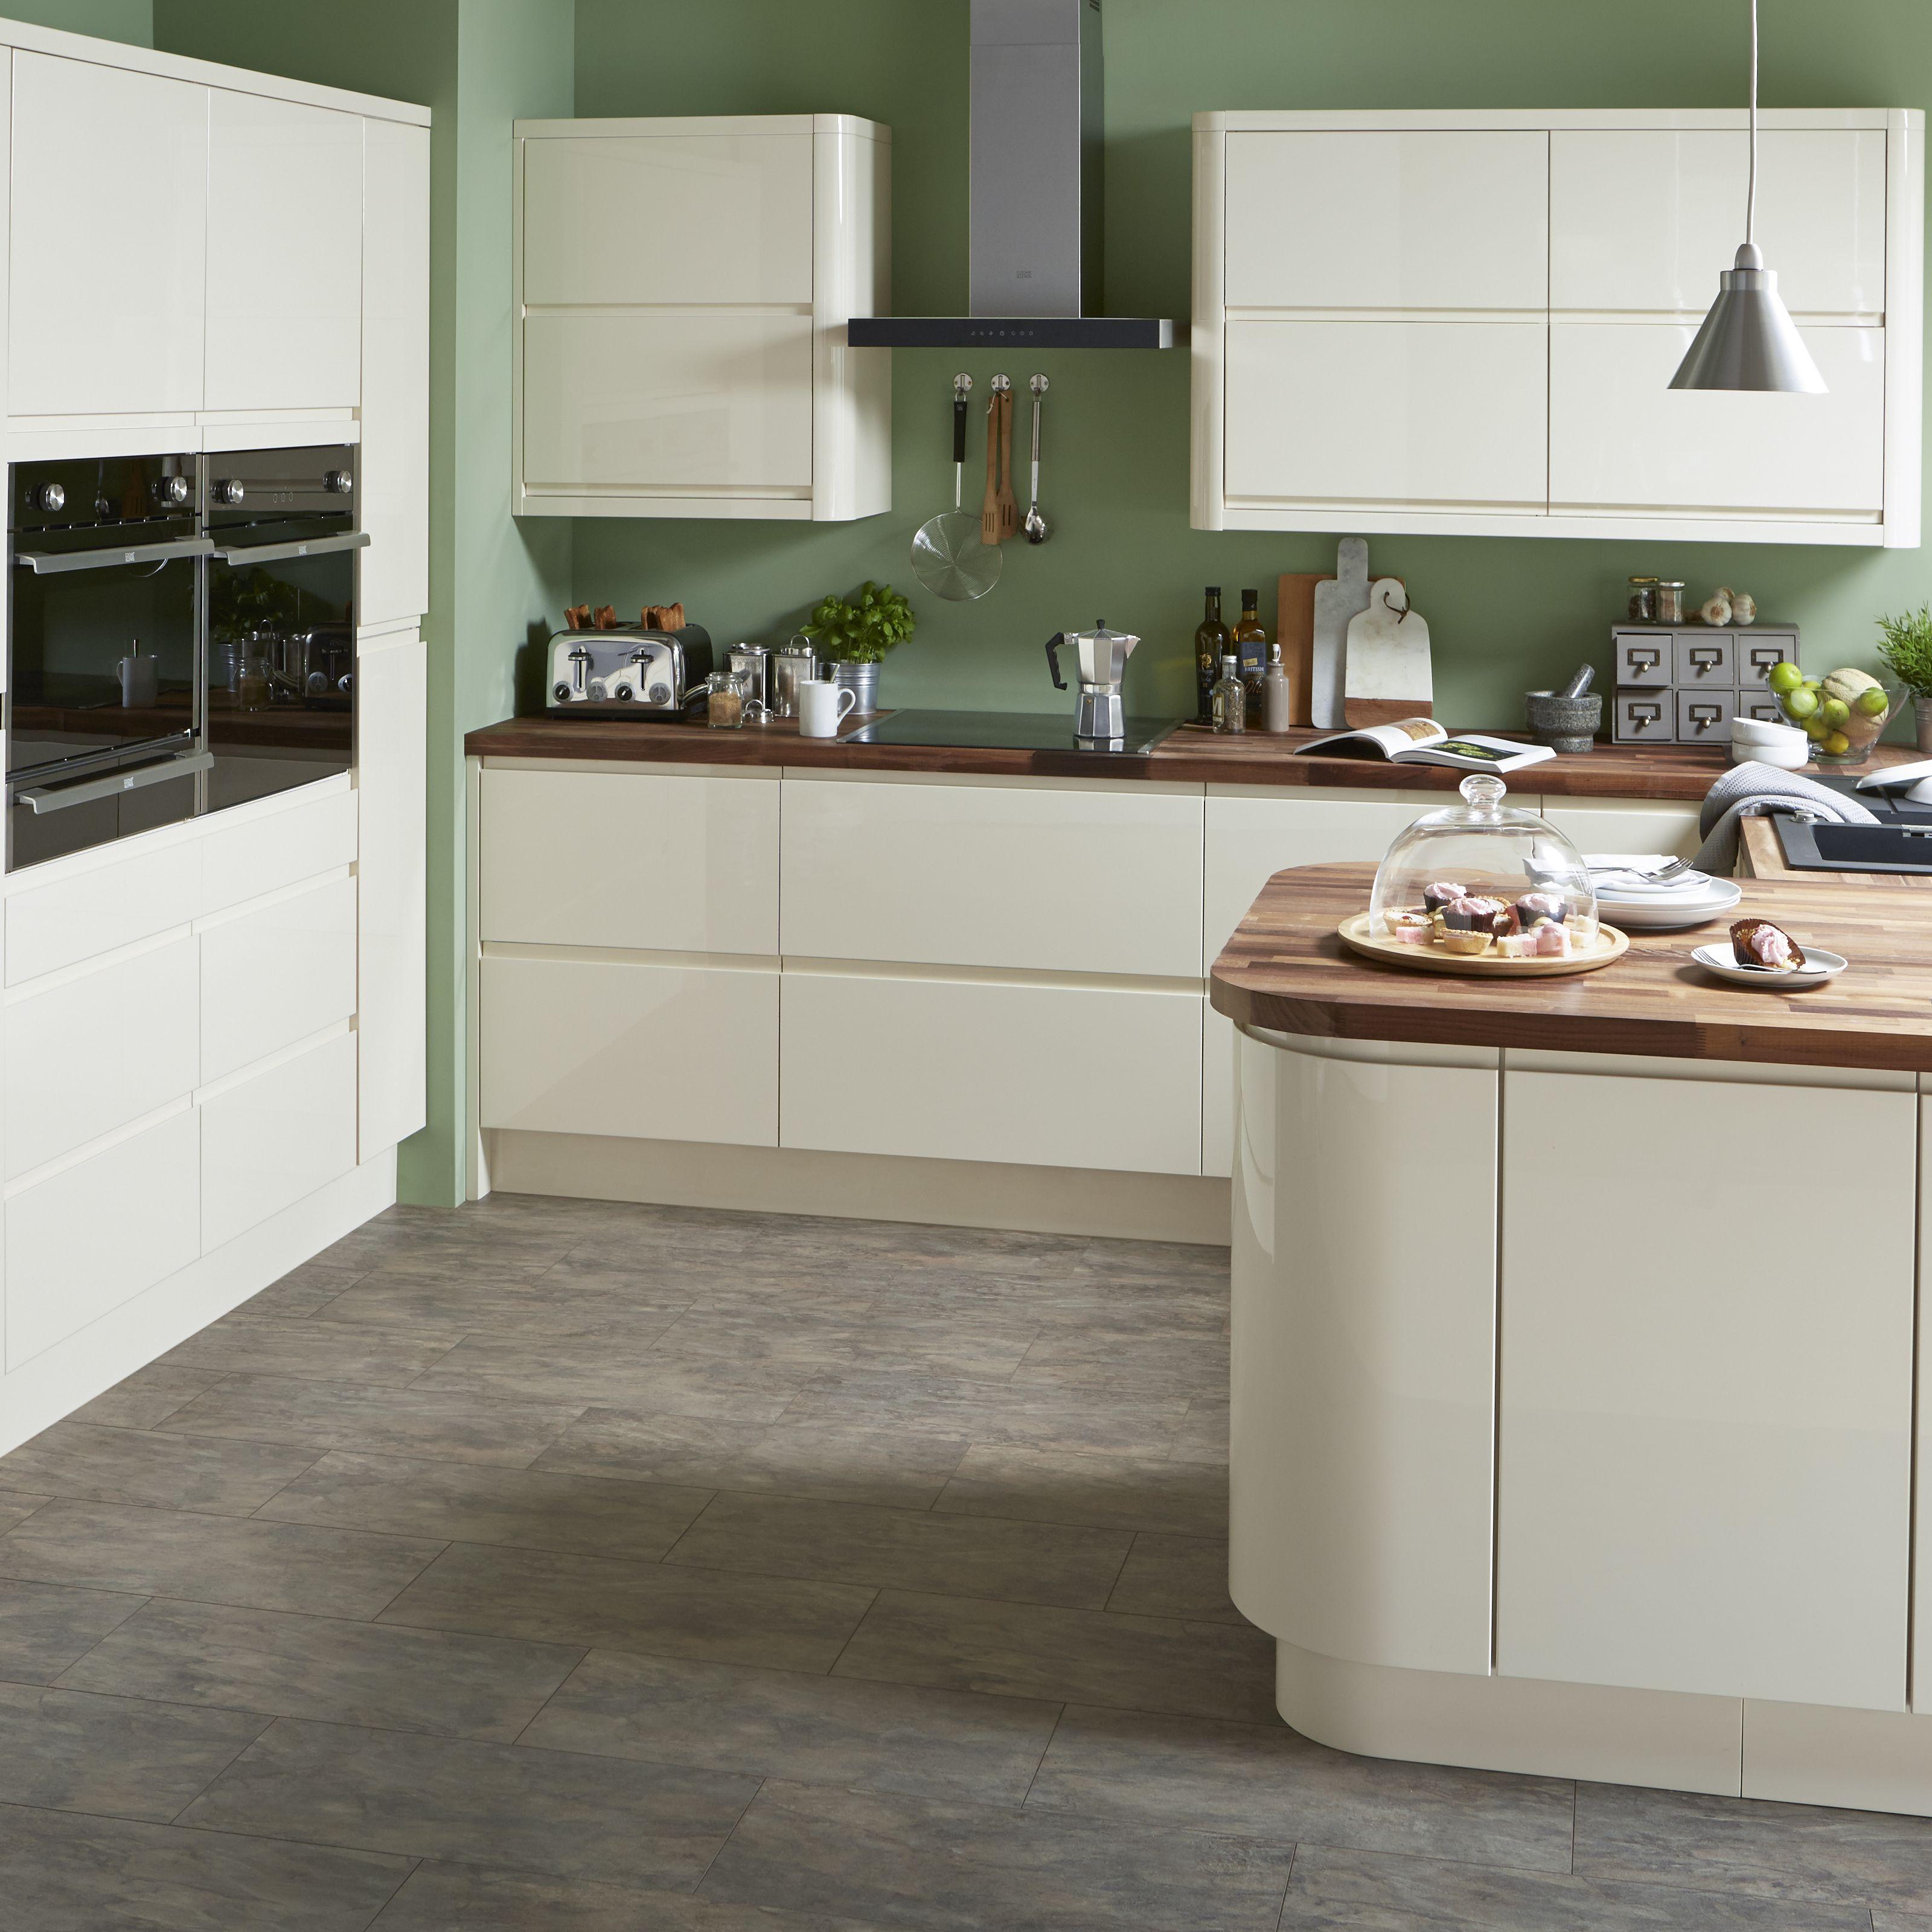 Contemporary Kitchen Design For Euromobil: Contemporary Kitchen Design Ideas